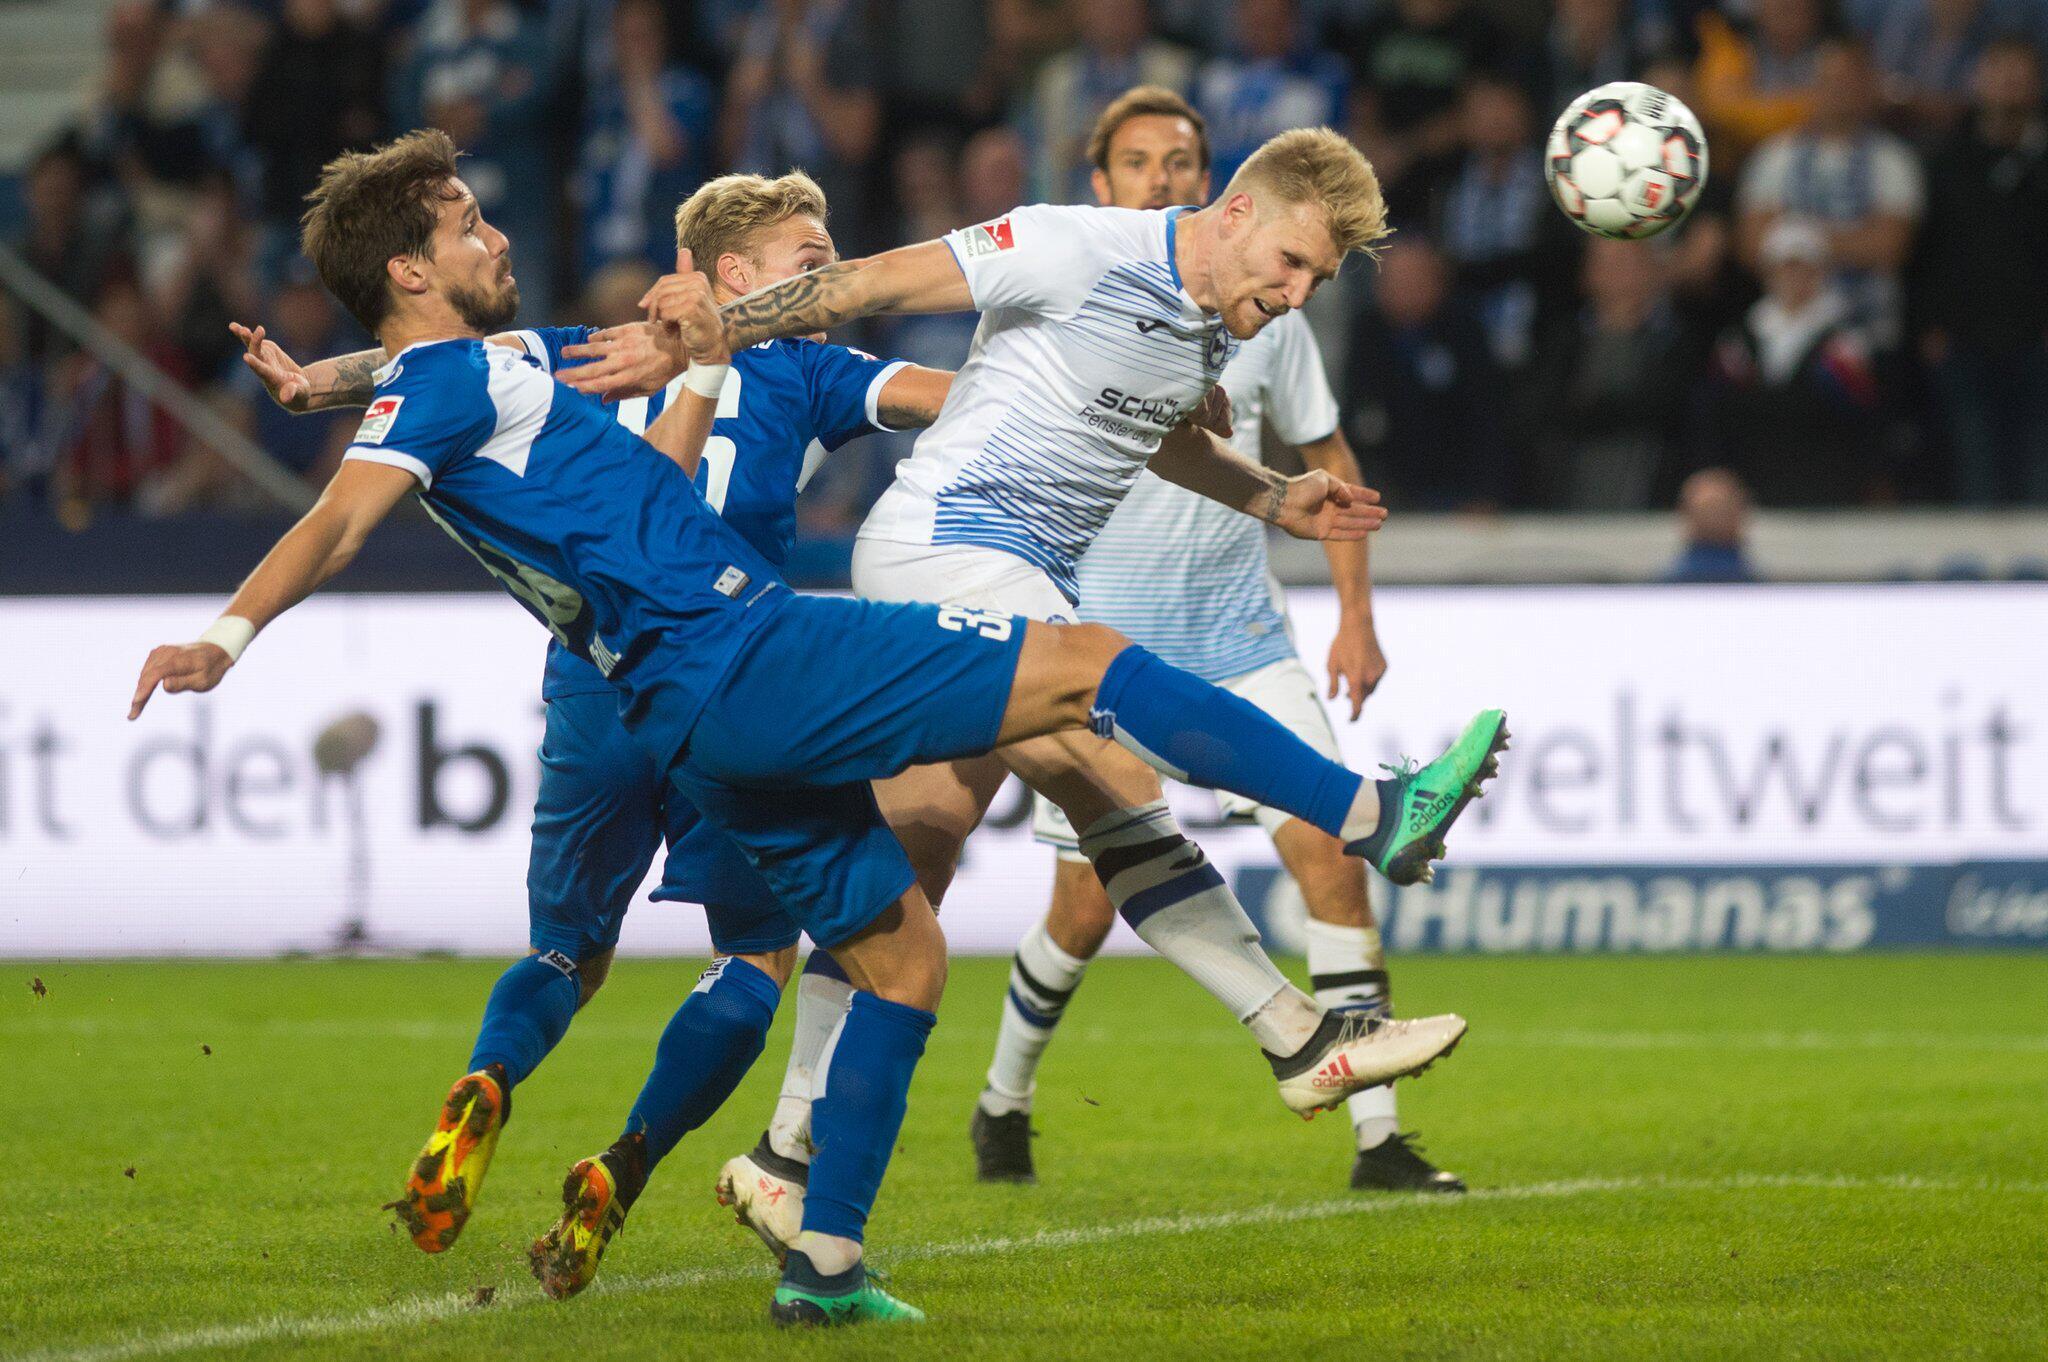 Bild zu 1. FC Magdeburg - Arminia Bielefeld